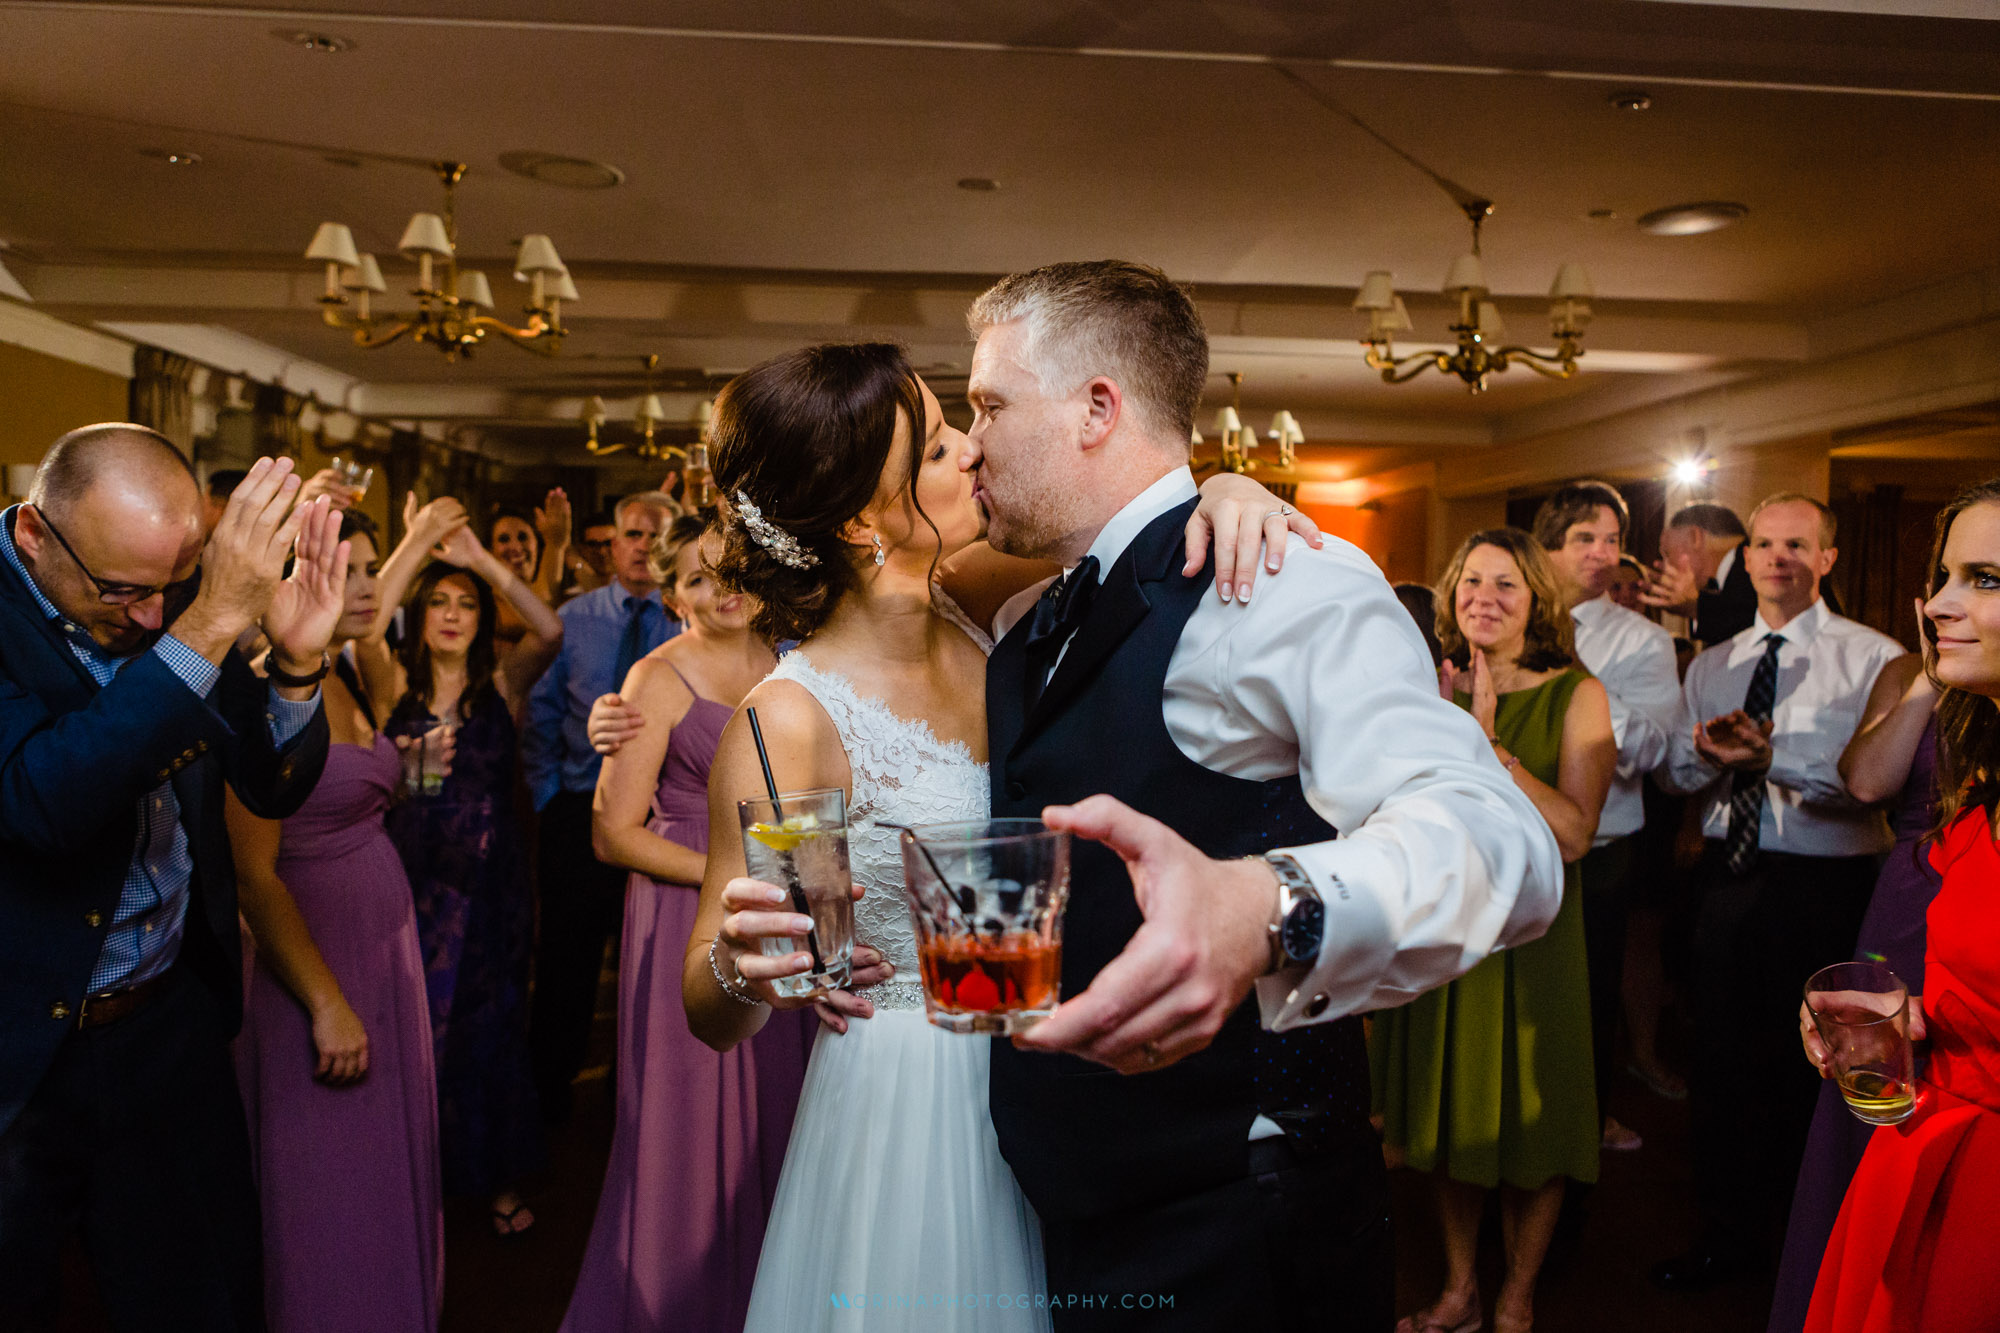 Colleen & Bill Wedding at Manufacturers' Golf & Country Club wedding 0087.jpg